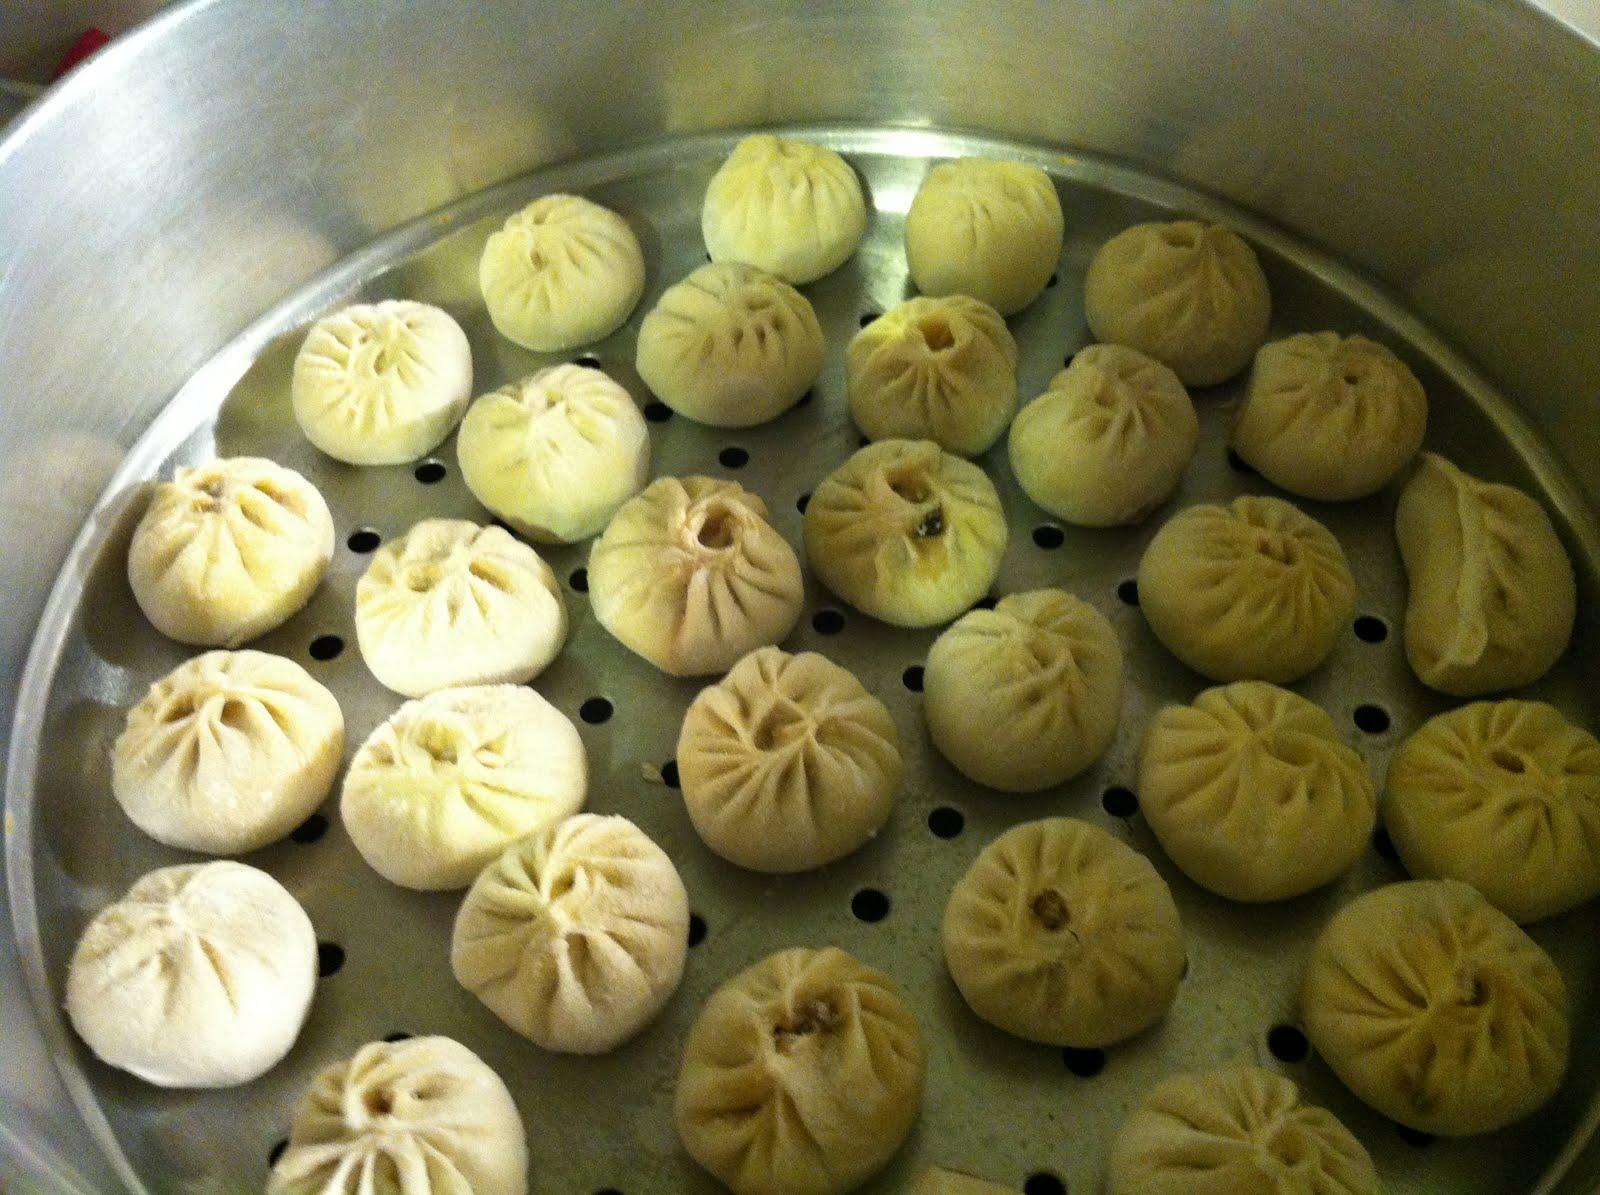 Cuisine of arunachal pradesh for Arunachal pradesh cuisine